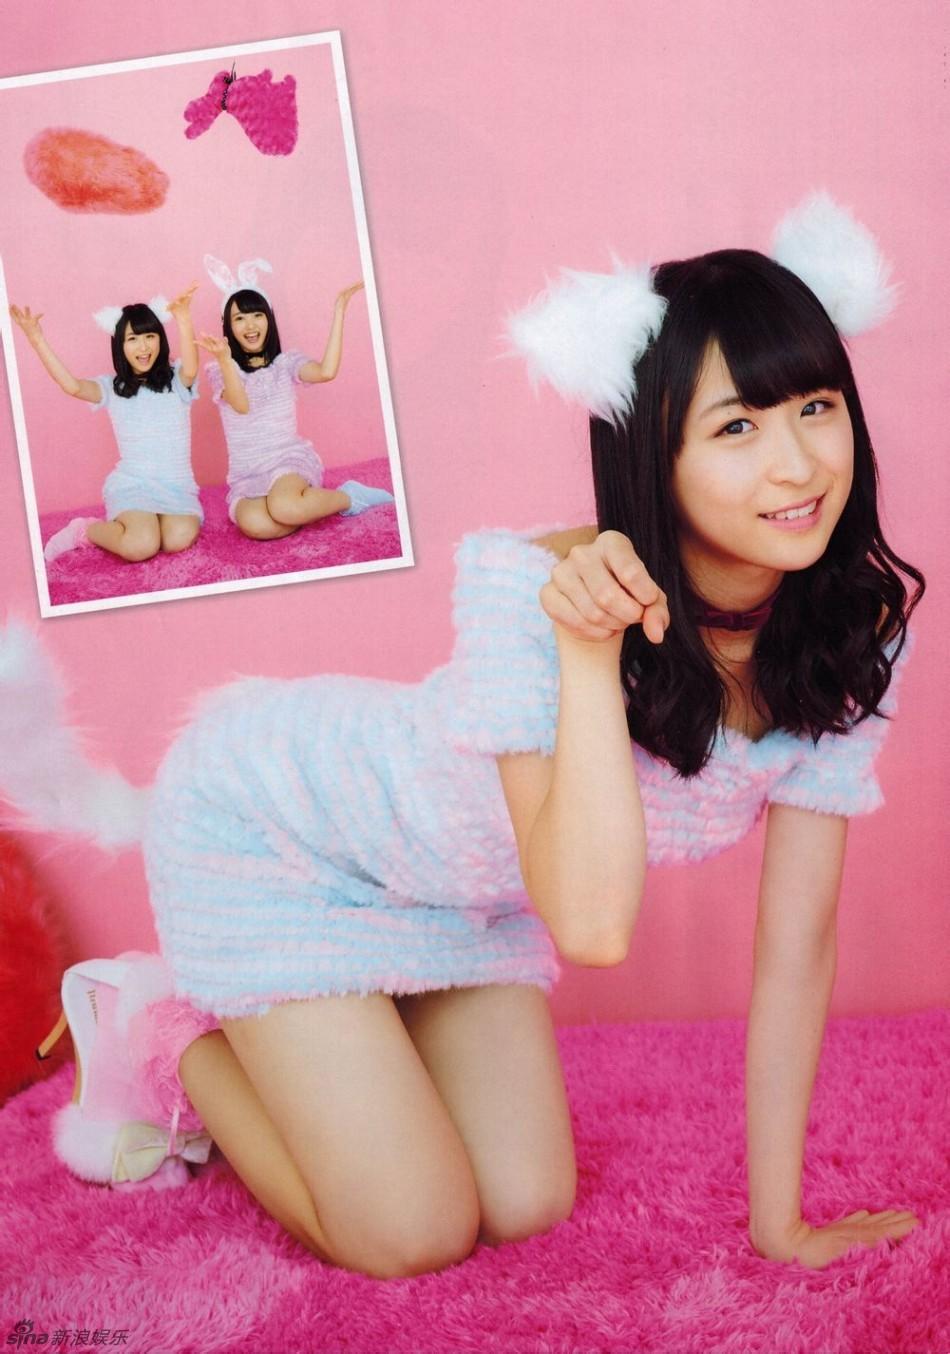 akb48 川本紗矢 『サヤプンテラジオ』 2016.02.13